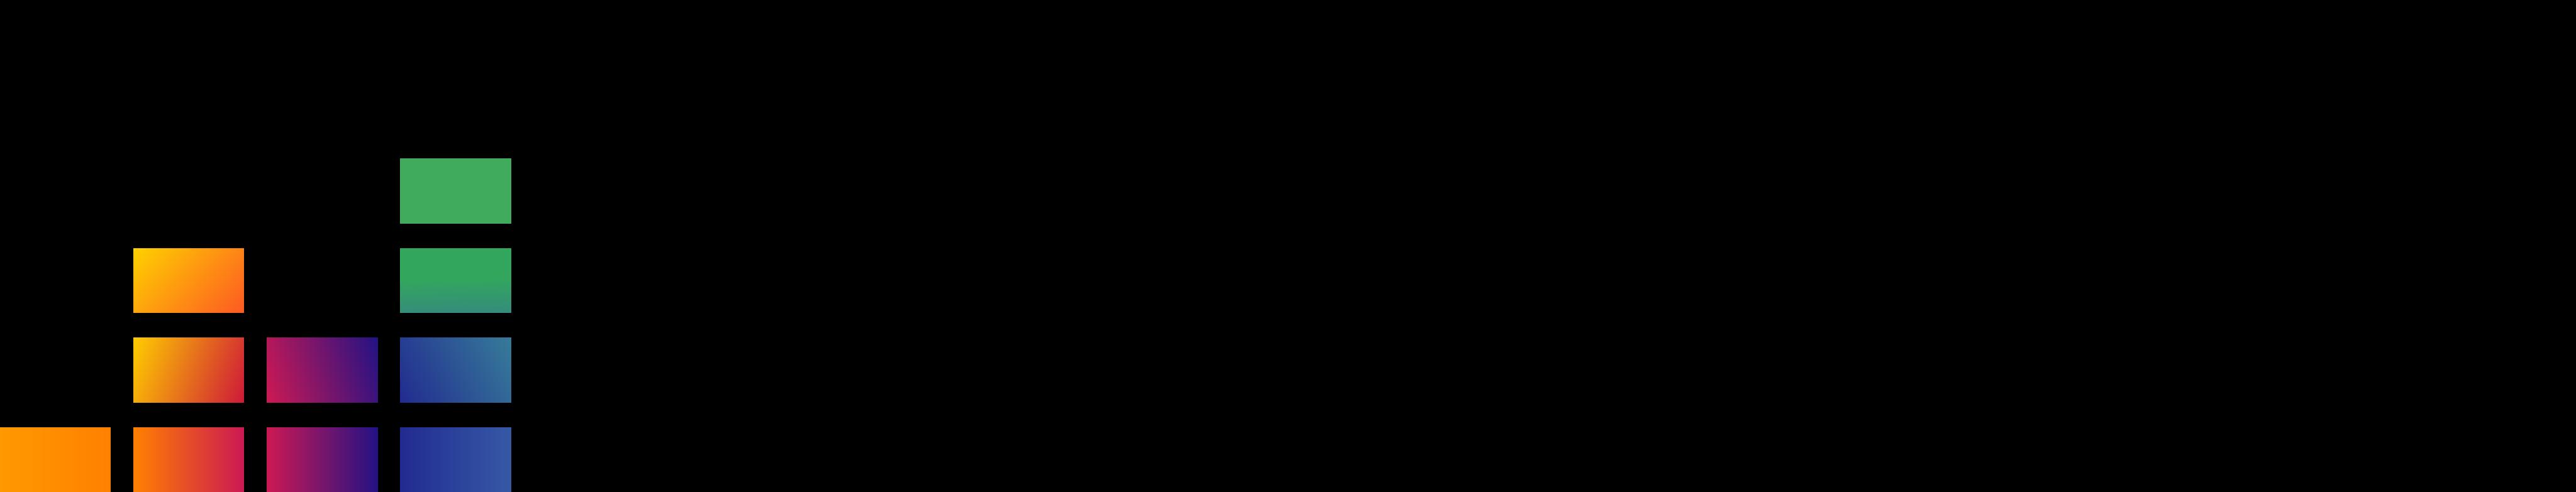 deezer logo 8 - Deezer Logo